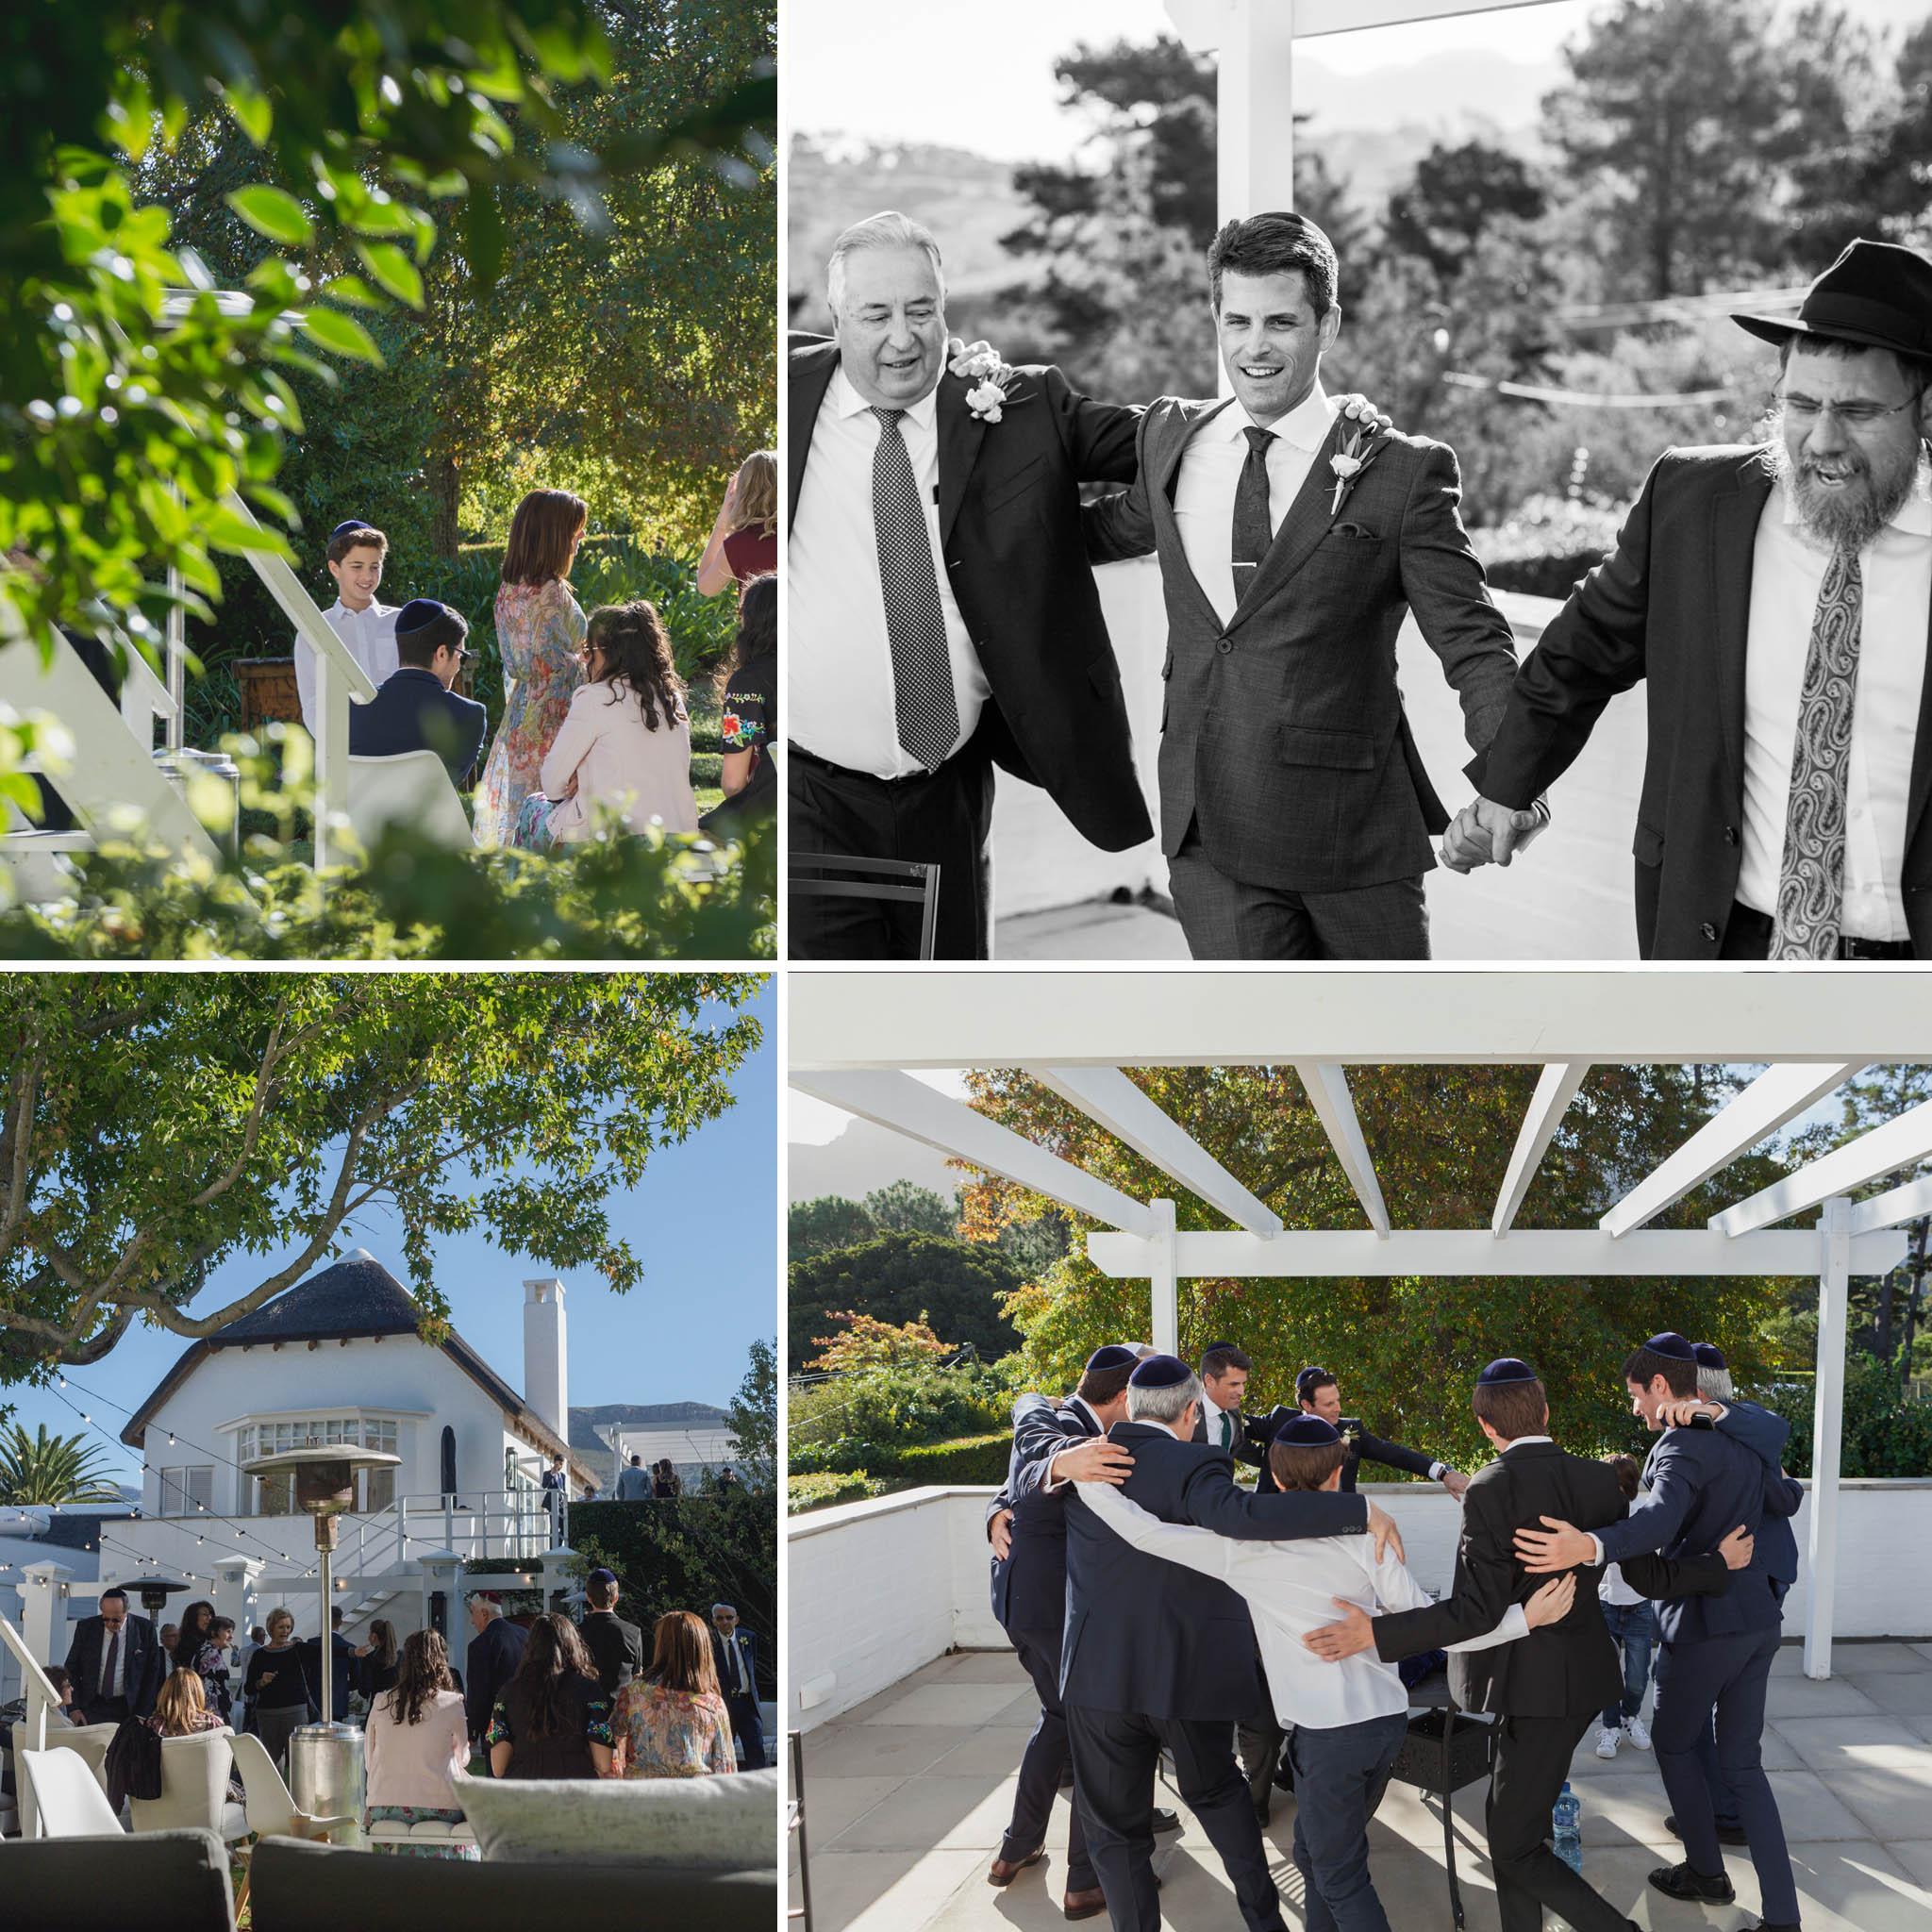 the-forum-embassy-wedding-cape-town-25.jpg